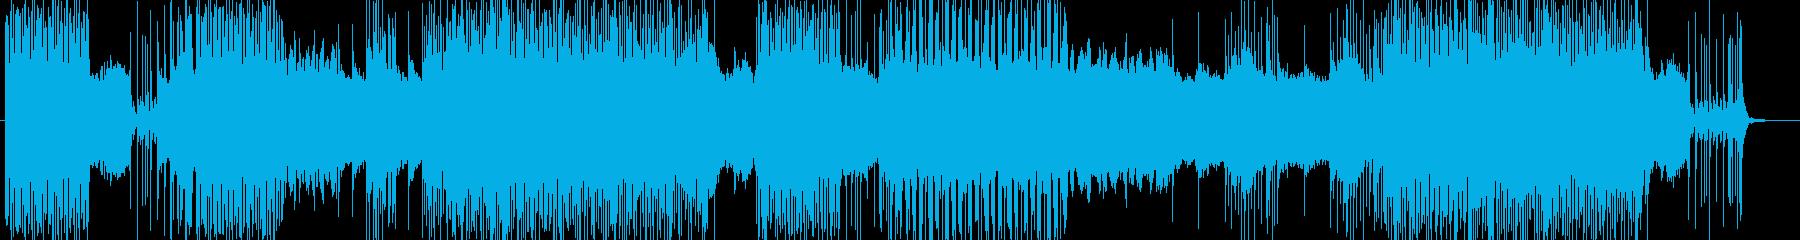 「HR/HM」「METAL」BGM226の再生済みの波形